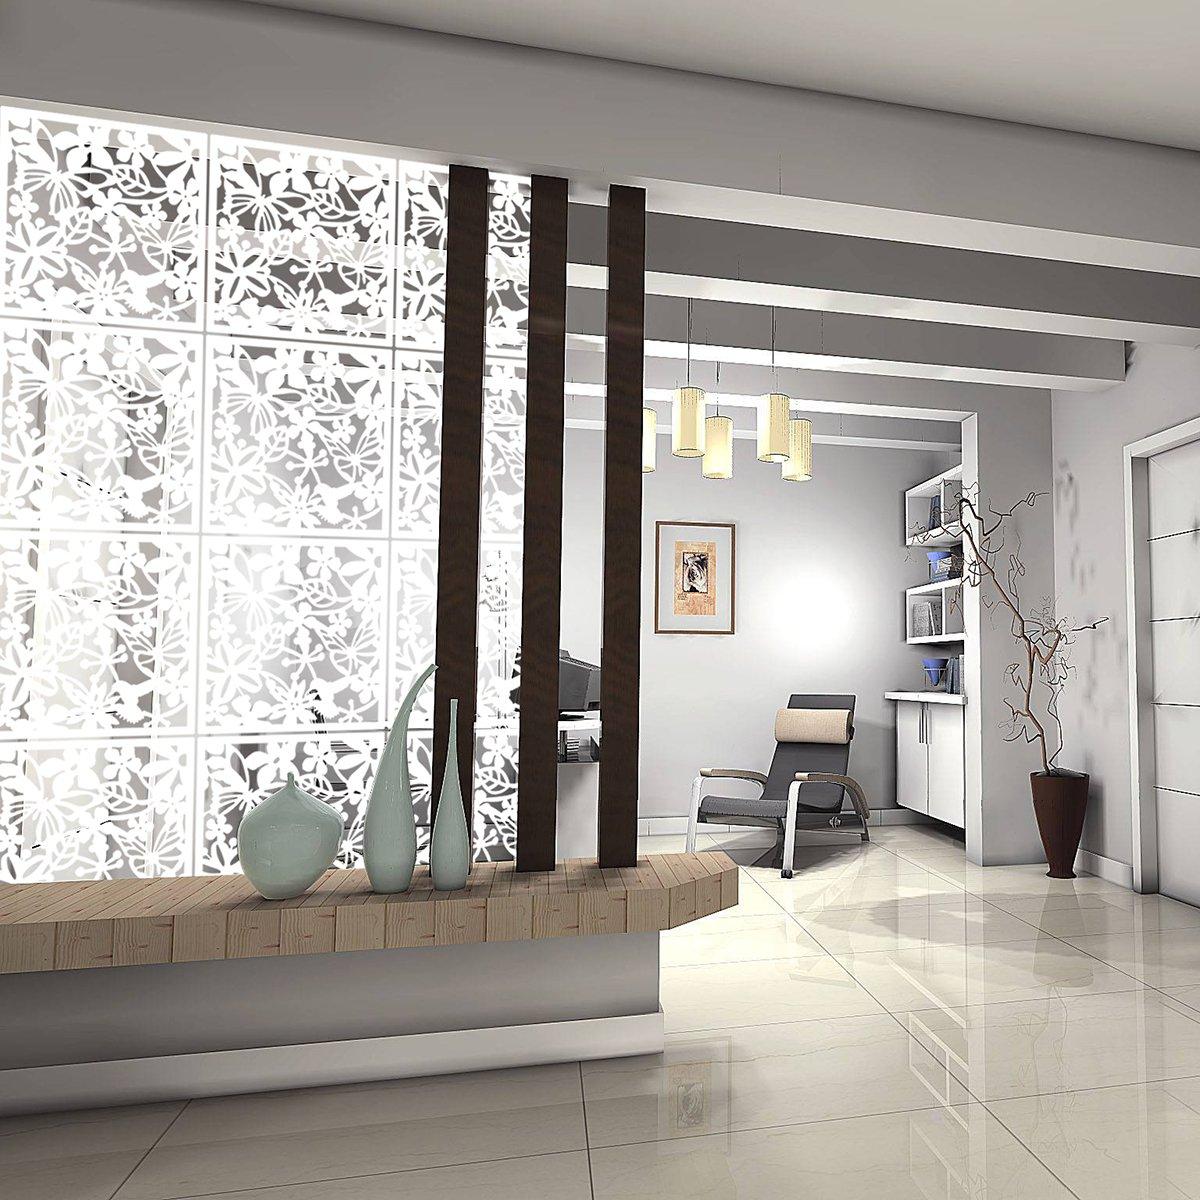 Amazon.com: Kernorv DIY Hanging Room Divider Made of Environmentally ...